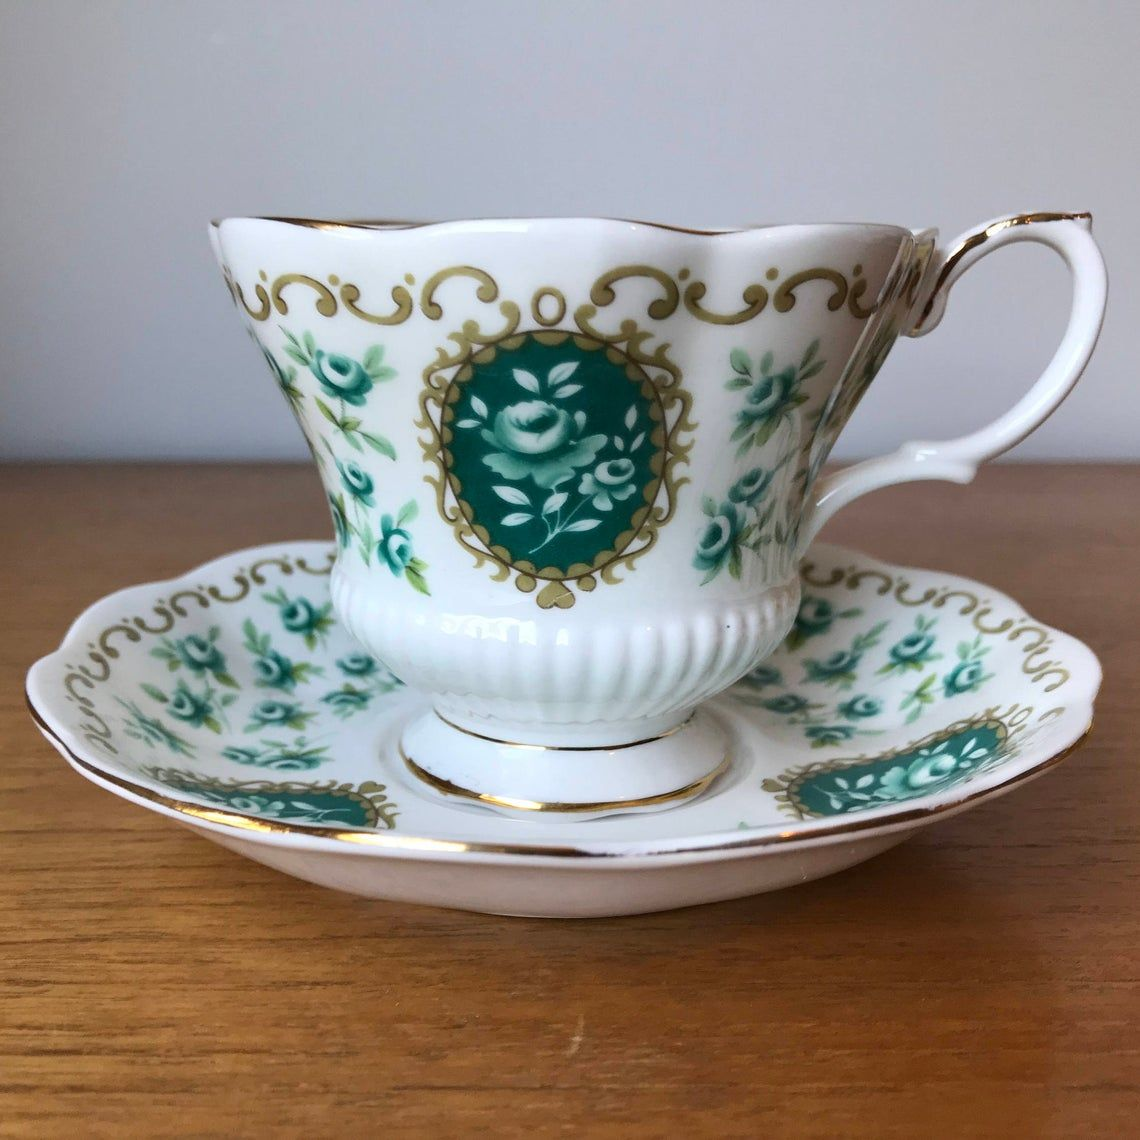 "Royal Albert Roses ""Memento"" Cameo Series Teacup and Saucer, Green Floral Tea Cup and Saucer, Bone China"